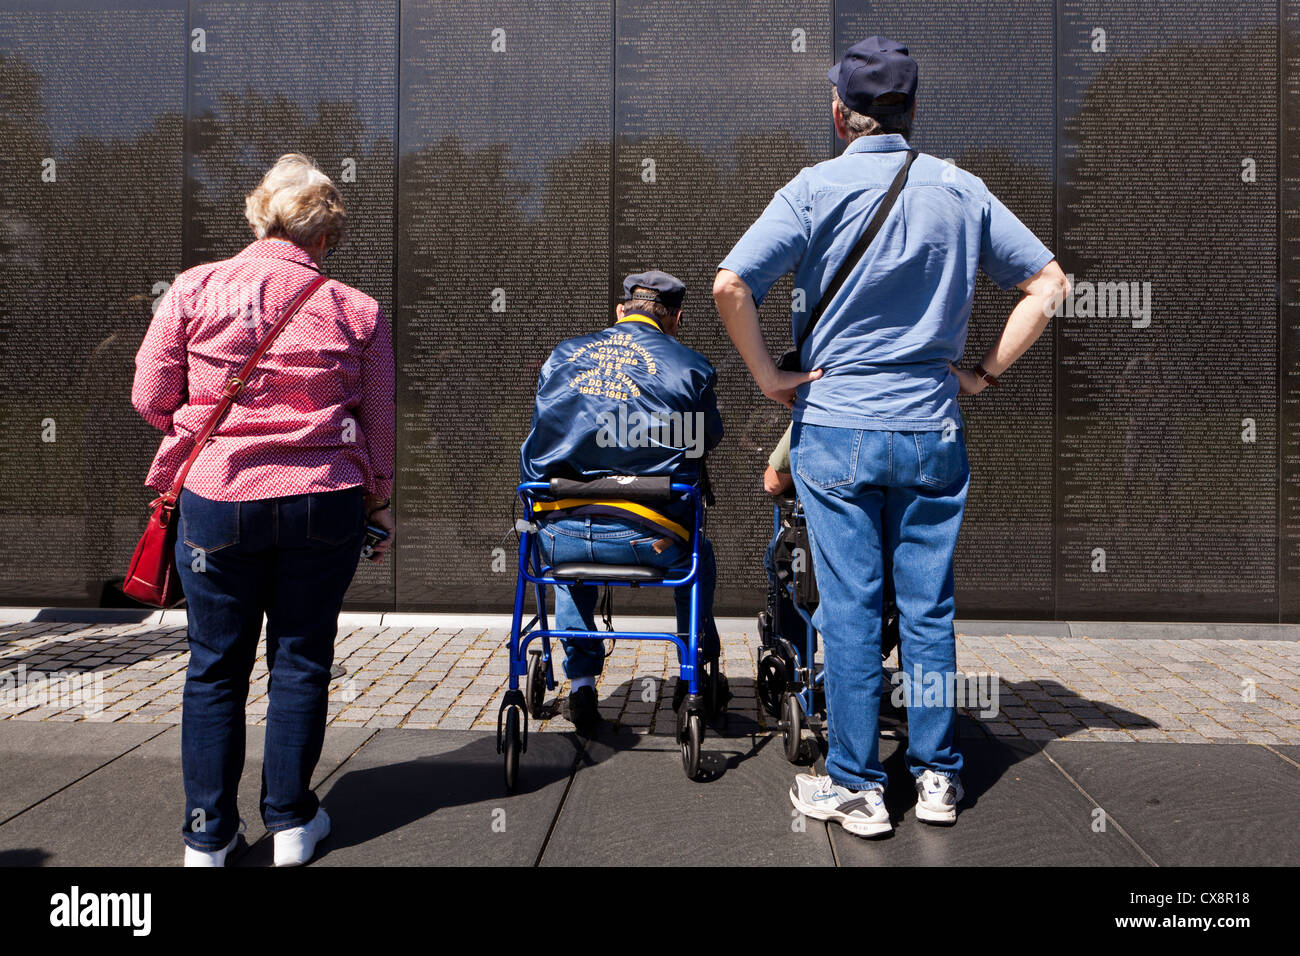 Vietnam Vets visiting the Vietnam War Memorial - Washington, DC - Stock Image